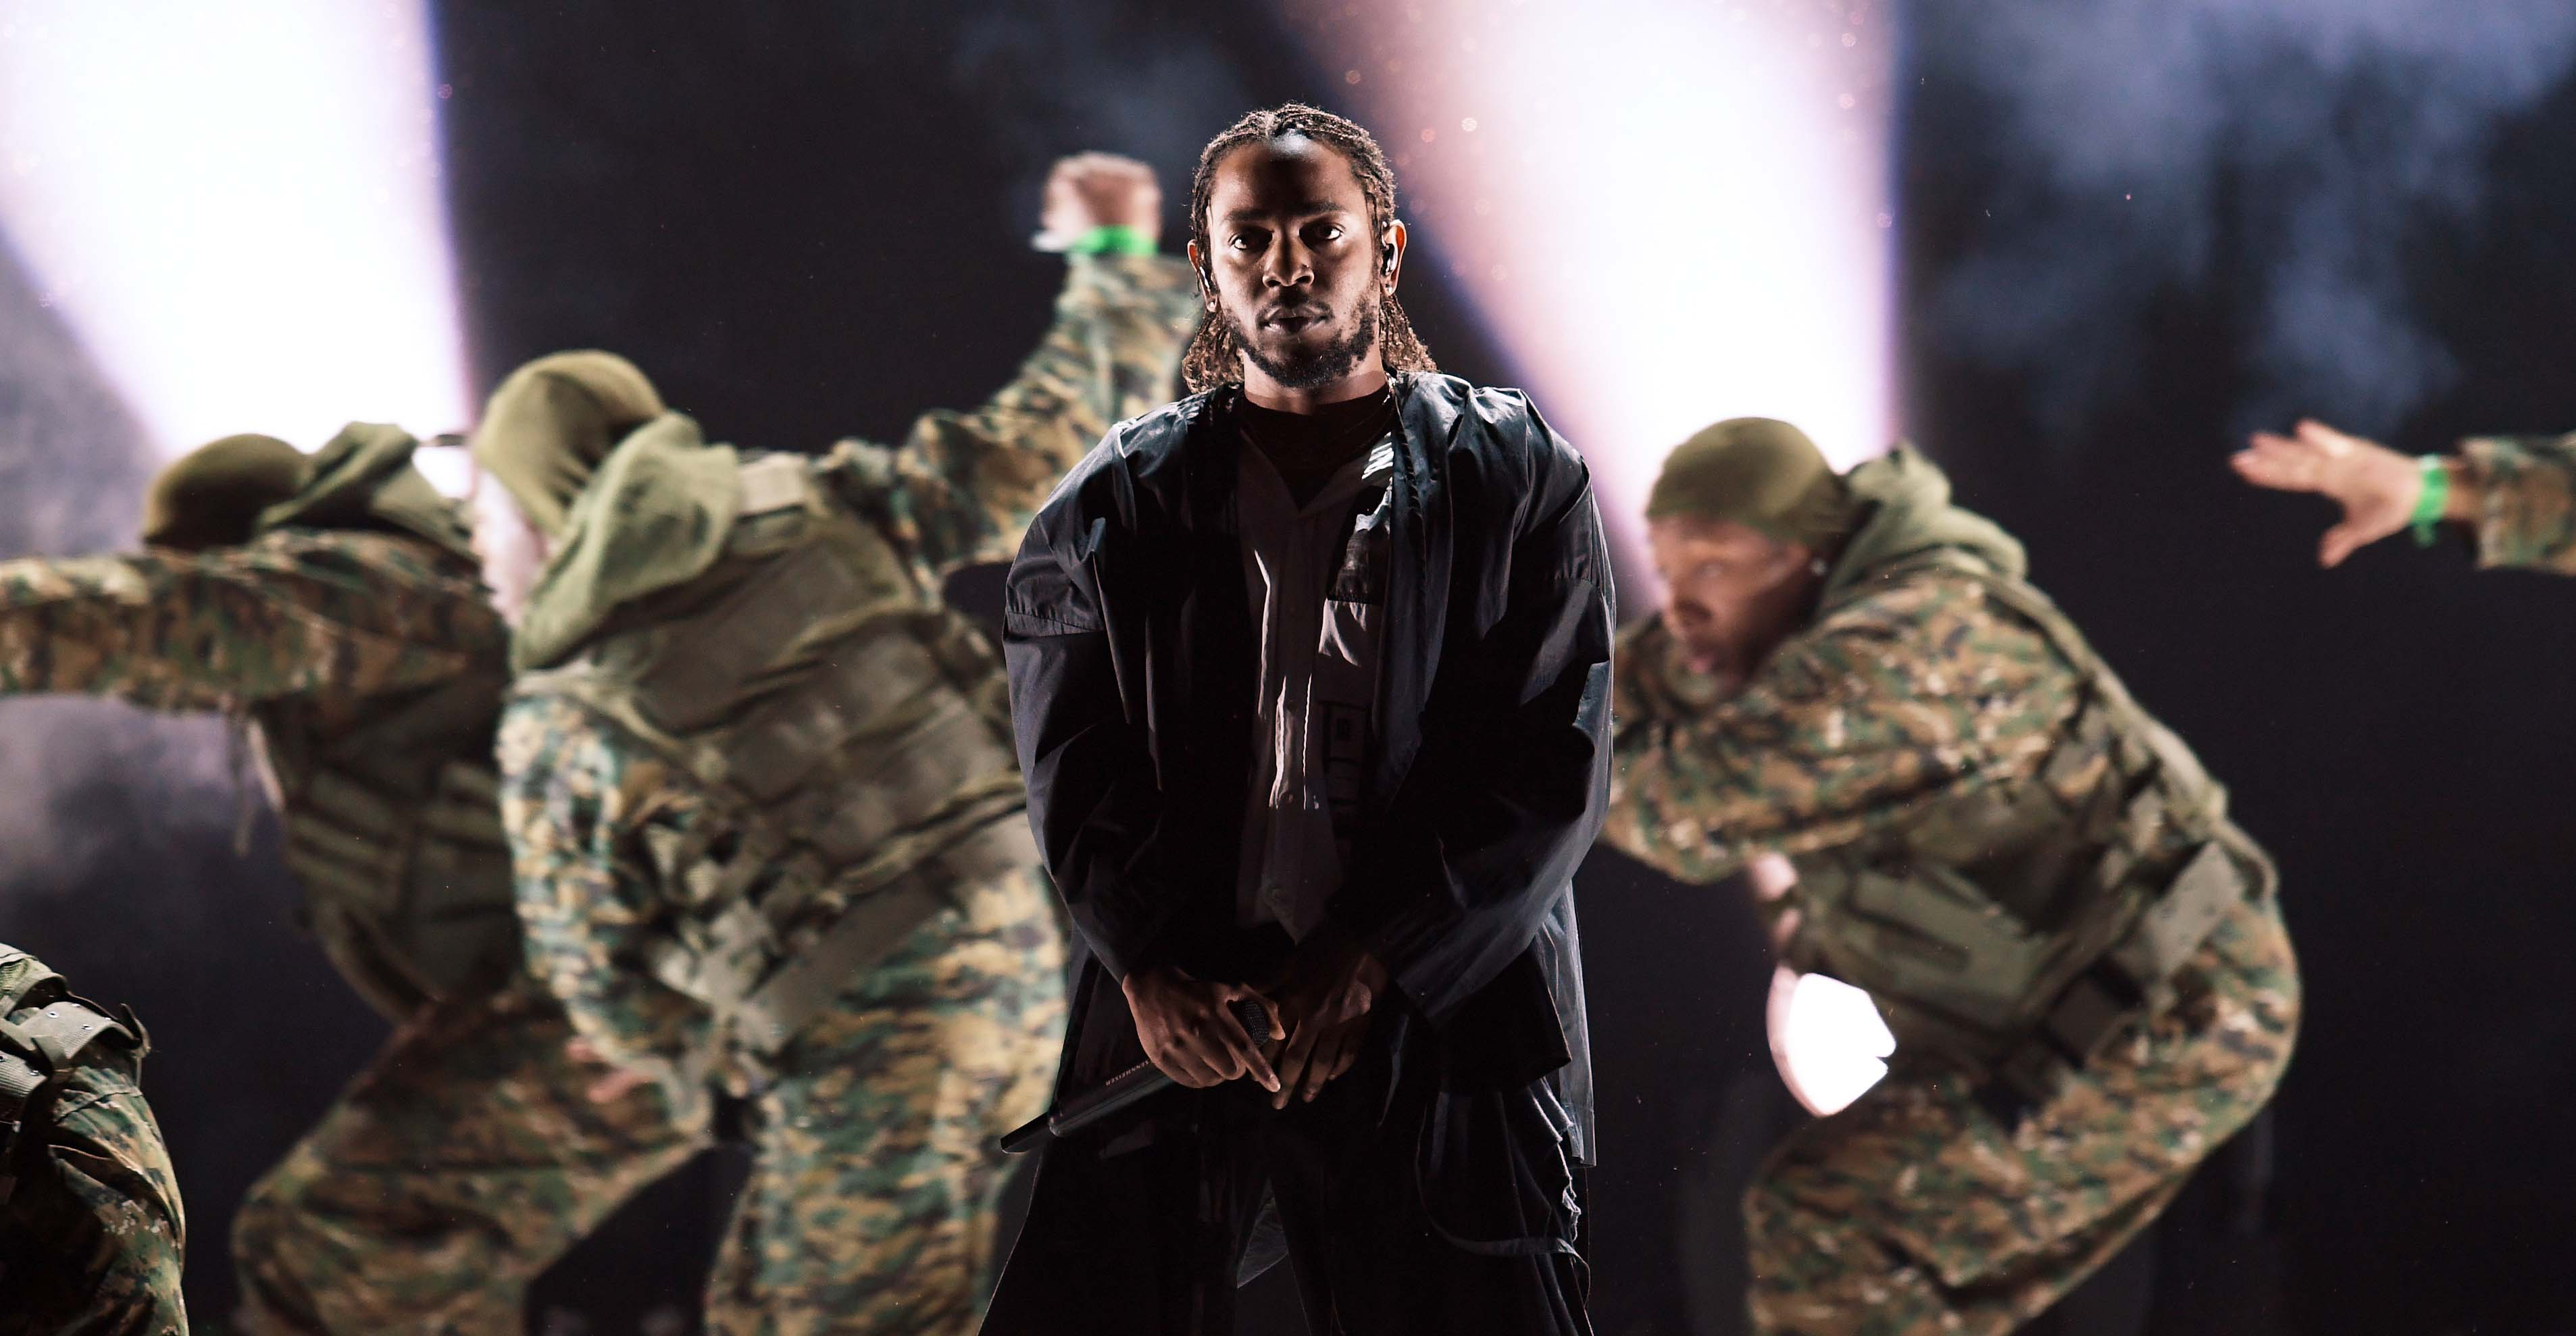 Kendrick Lamar compró boletos para que niños vean 'Black Panther'